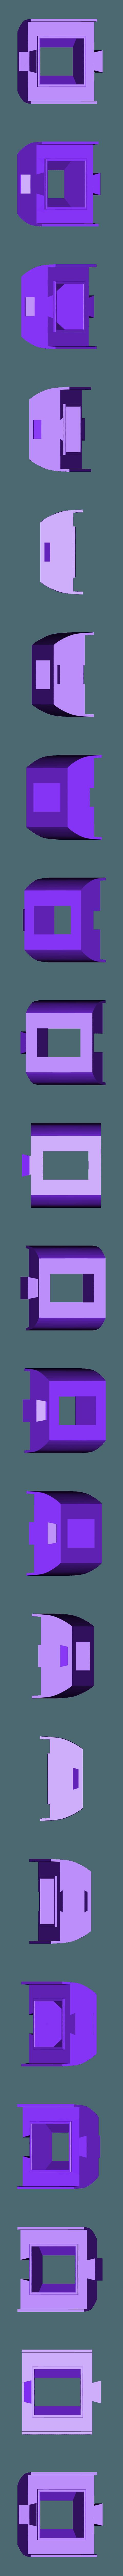 cas_modular_middle_top.stl Download free STL file CAS - the modular xyz-cube cargo ship • 3D printing template, vandragon_de